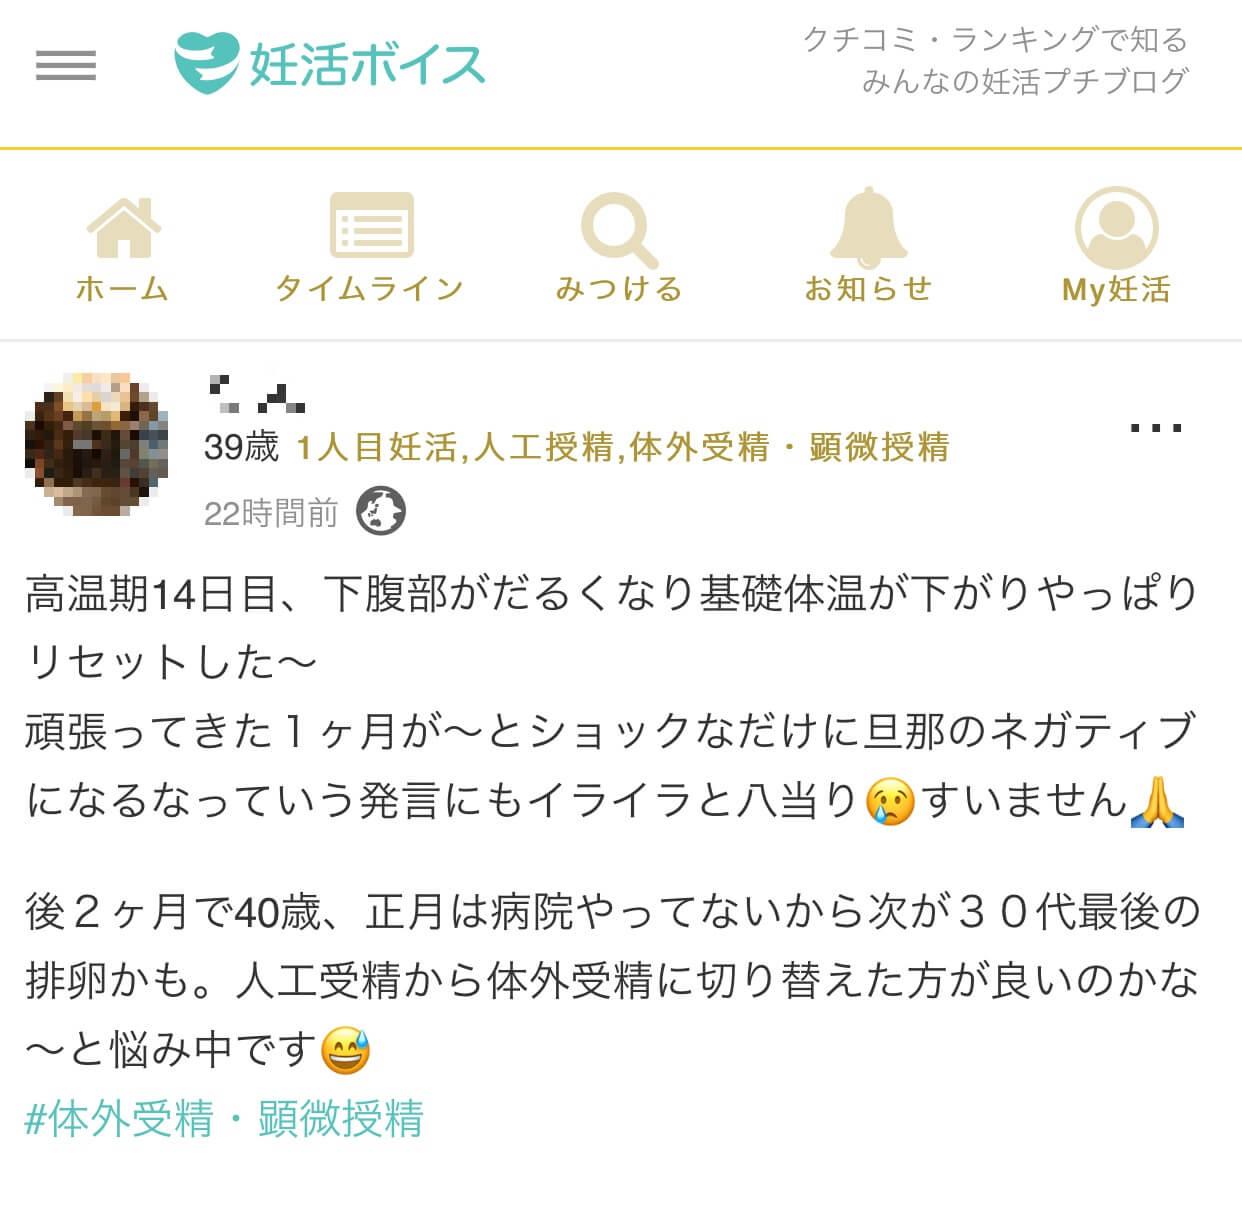 Rさん(39歳・1人目妊活・人工授精・体外受精・顕微授精)